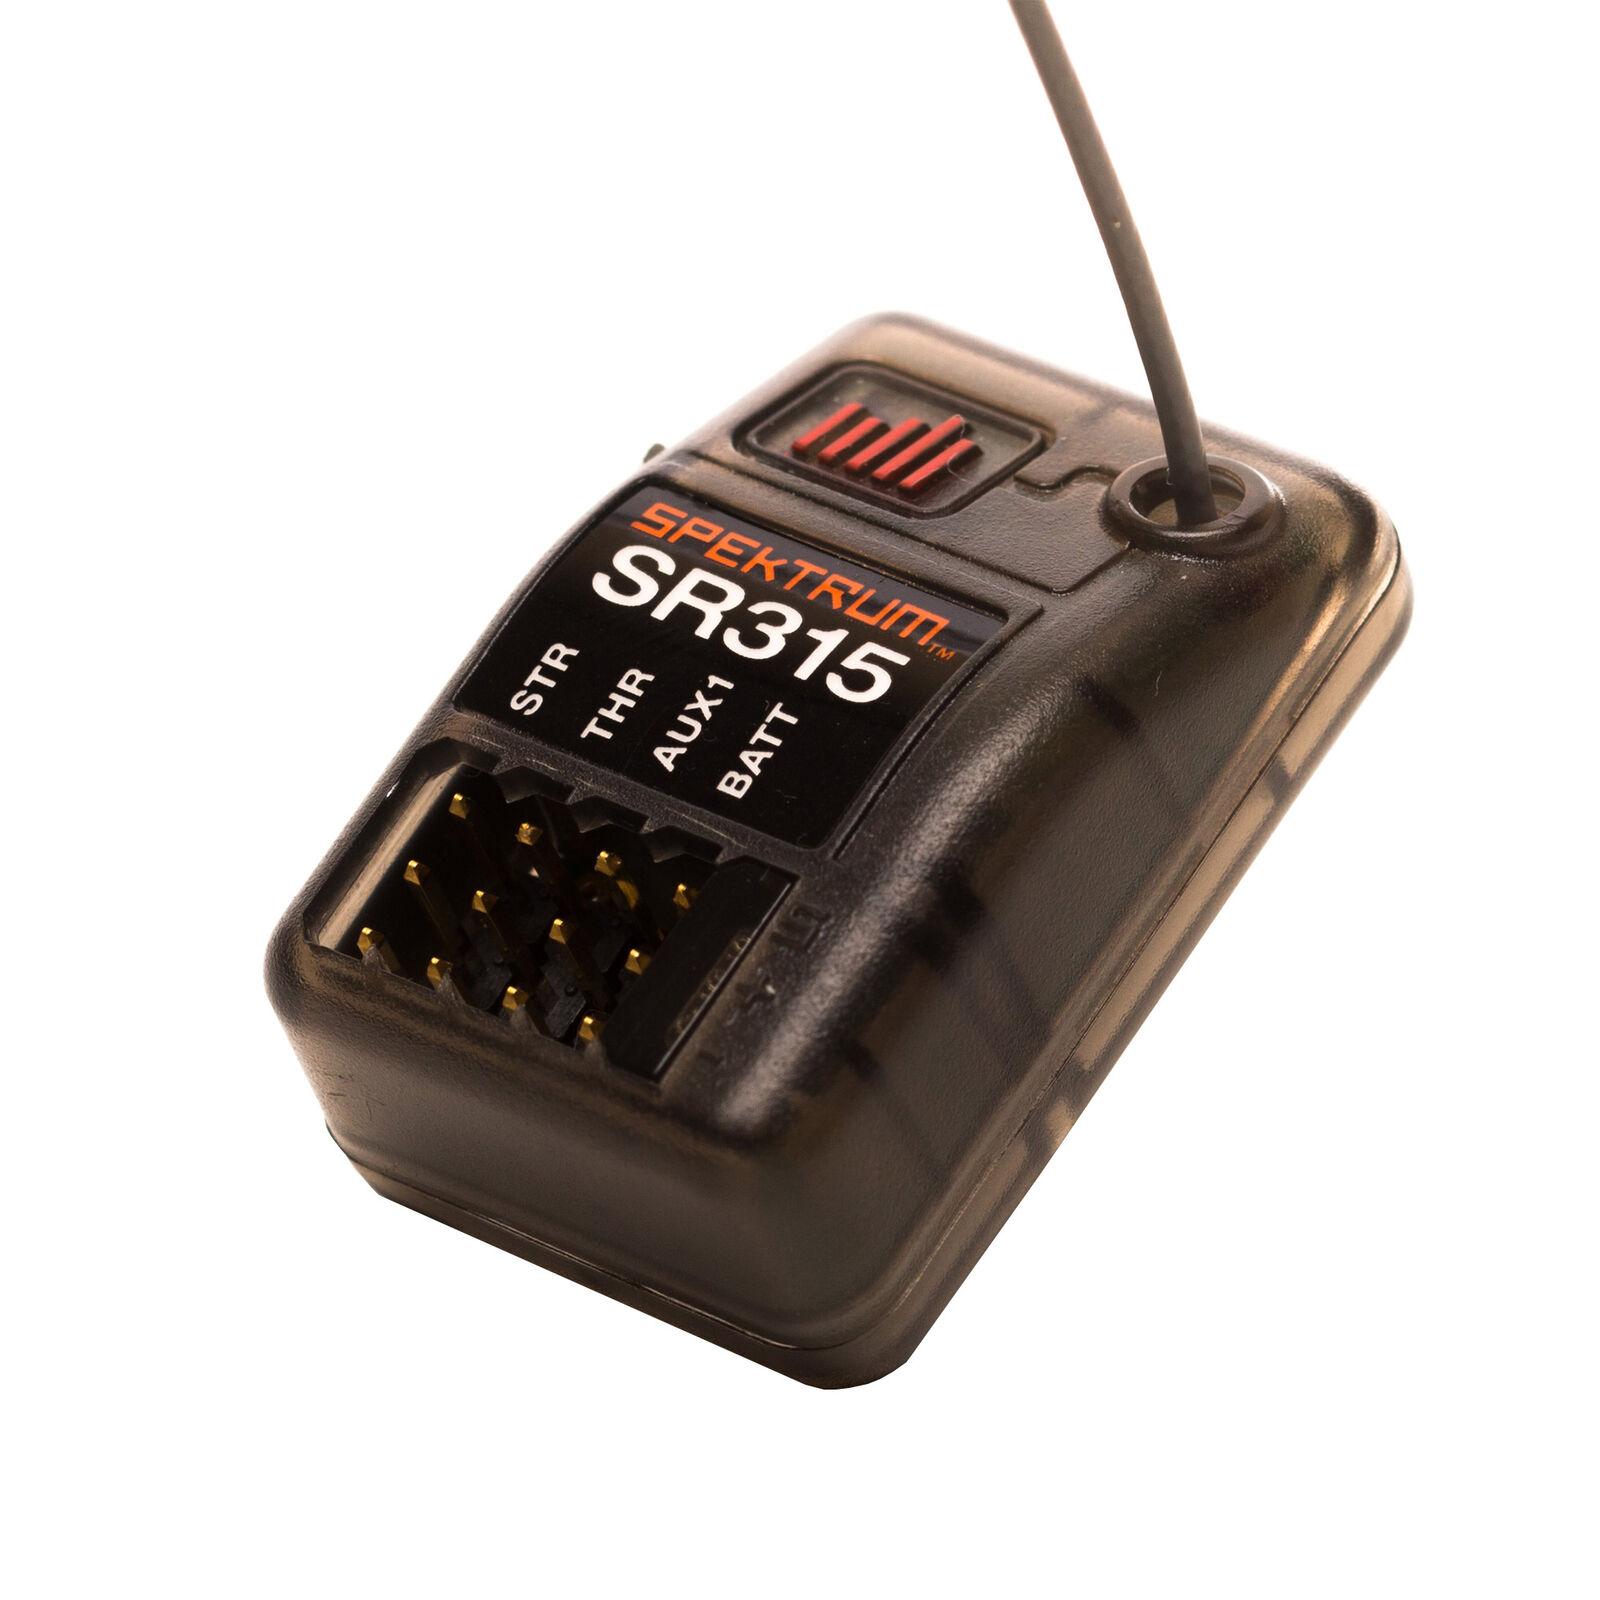 SR315 DSMR 3-Channel Sport Receiver